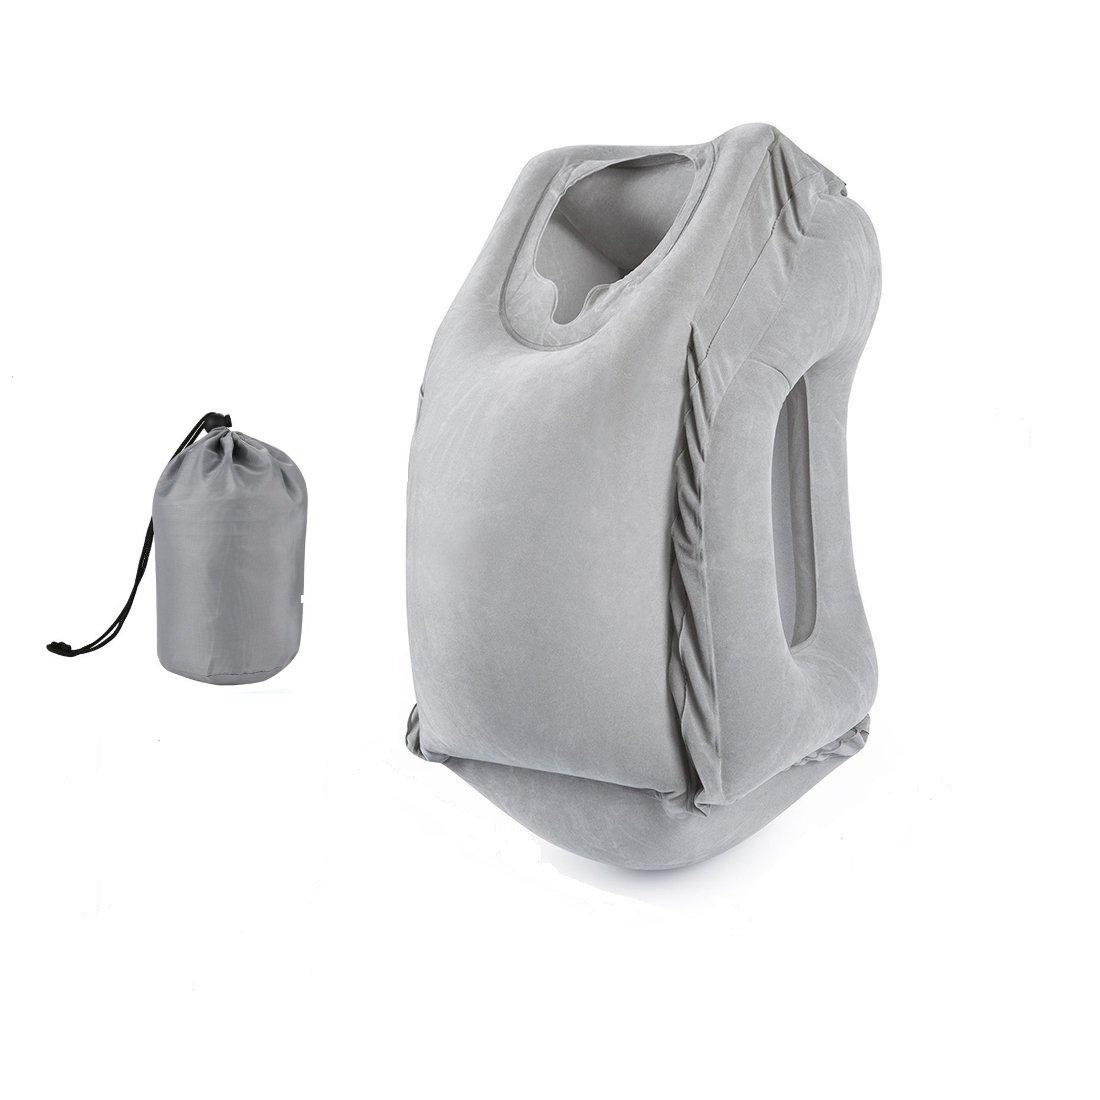 YKHS Inflatable Travel Pillow, Fast Inflatable Pillow,  Plane Pillow, Train,  Bus , Office, Ergonomic Portable Travel Pillow Soft PVC Flocking Grey